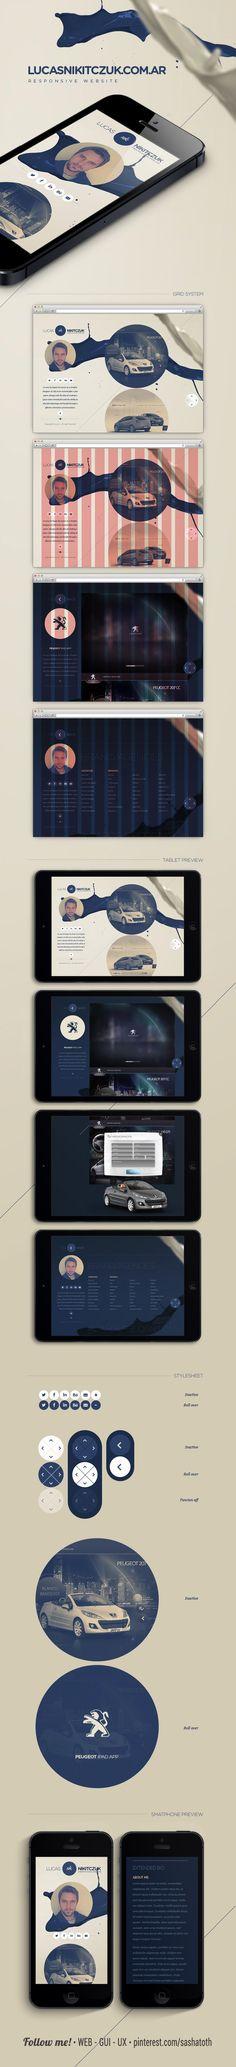 "Lucas Nikitczuk | Responsive Website *** ""This is my personal portfolio made with responsive design."" by Lucas Nikitczuk"